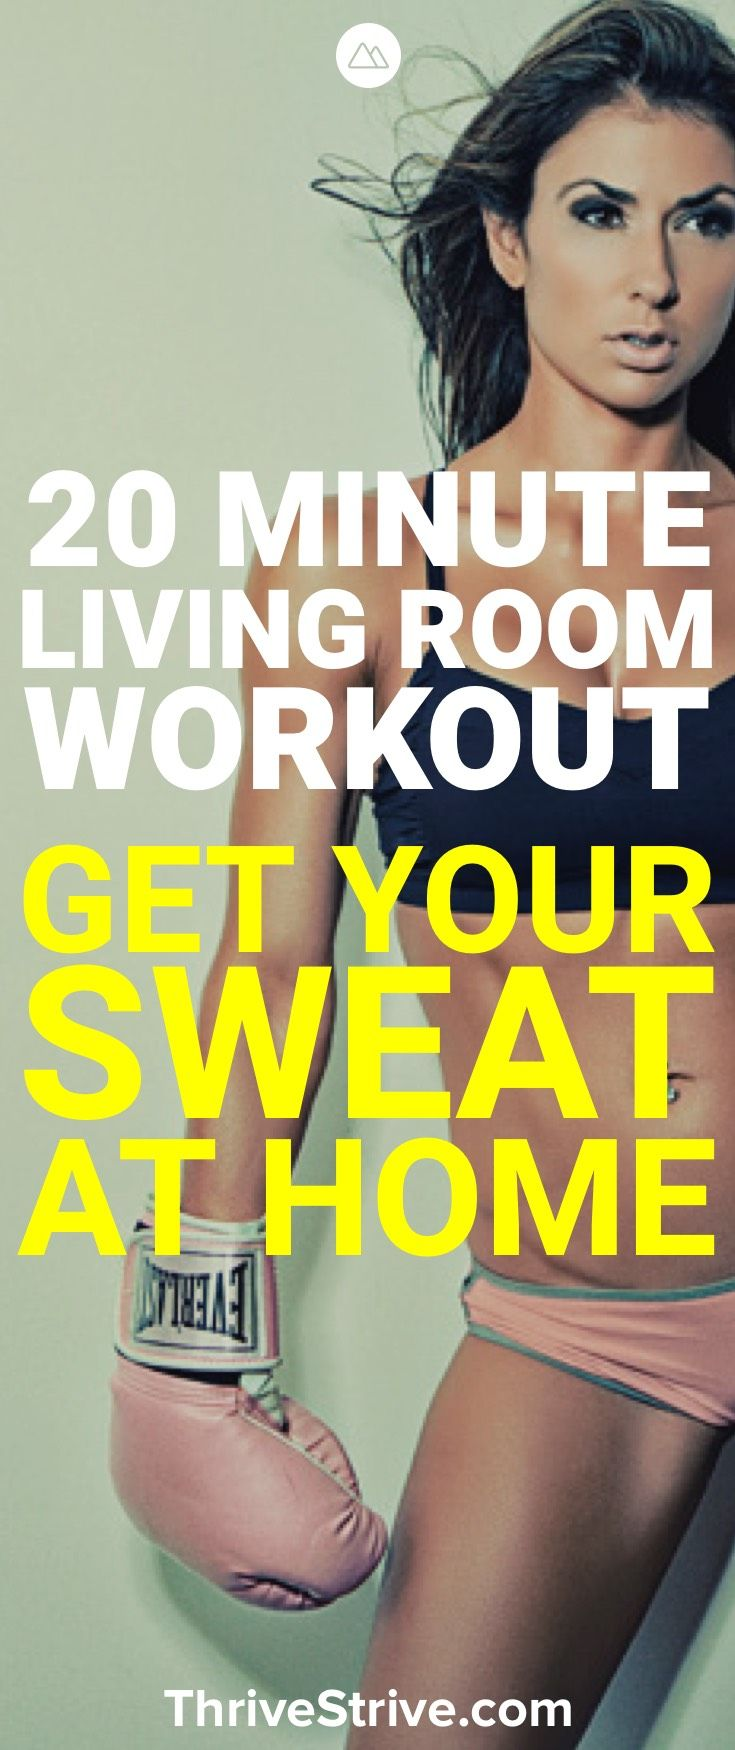 20 Minute Living Room Workout - [peenmedia.com]